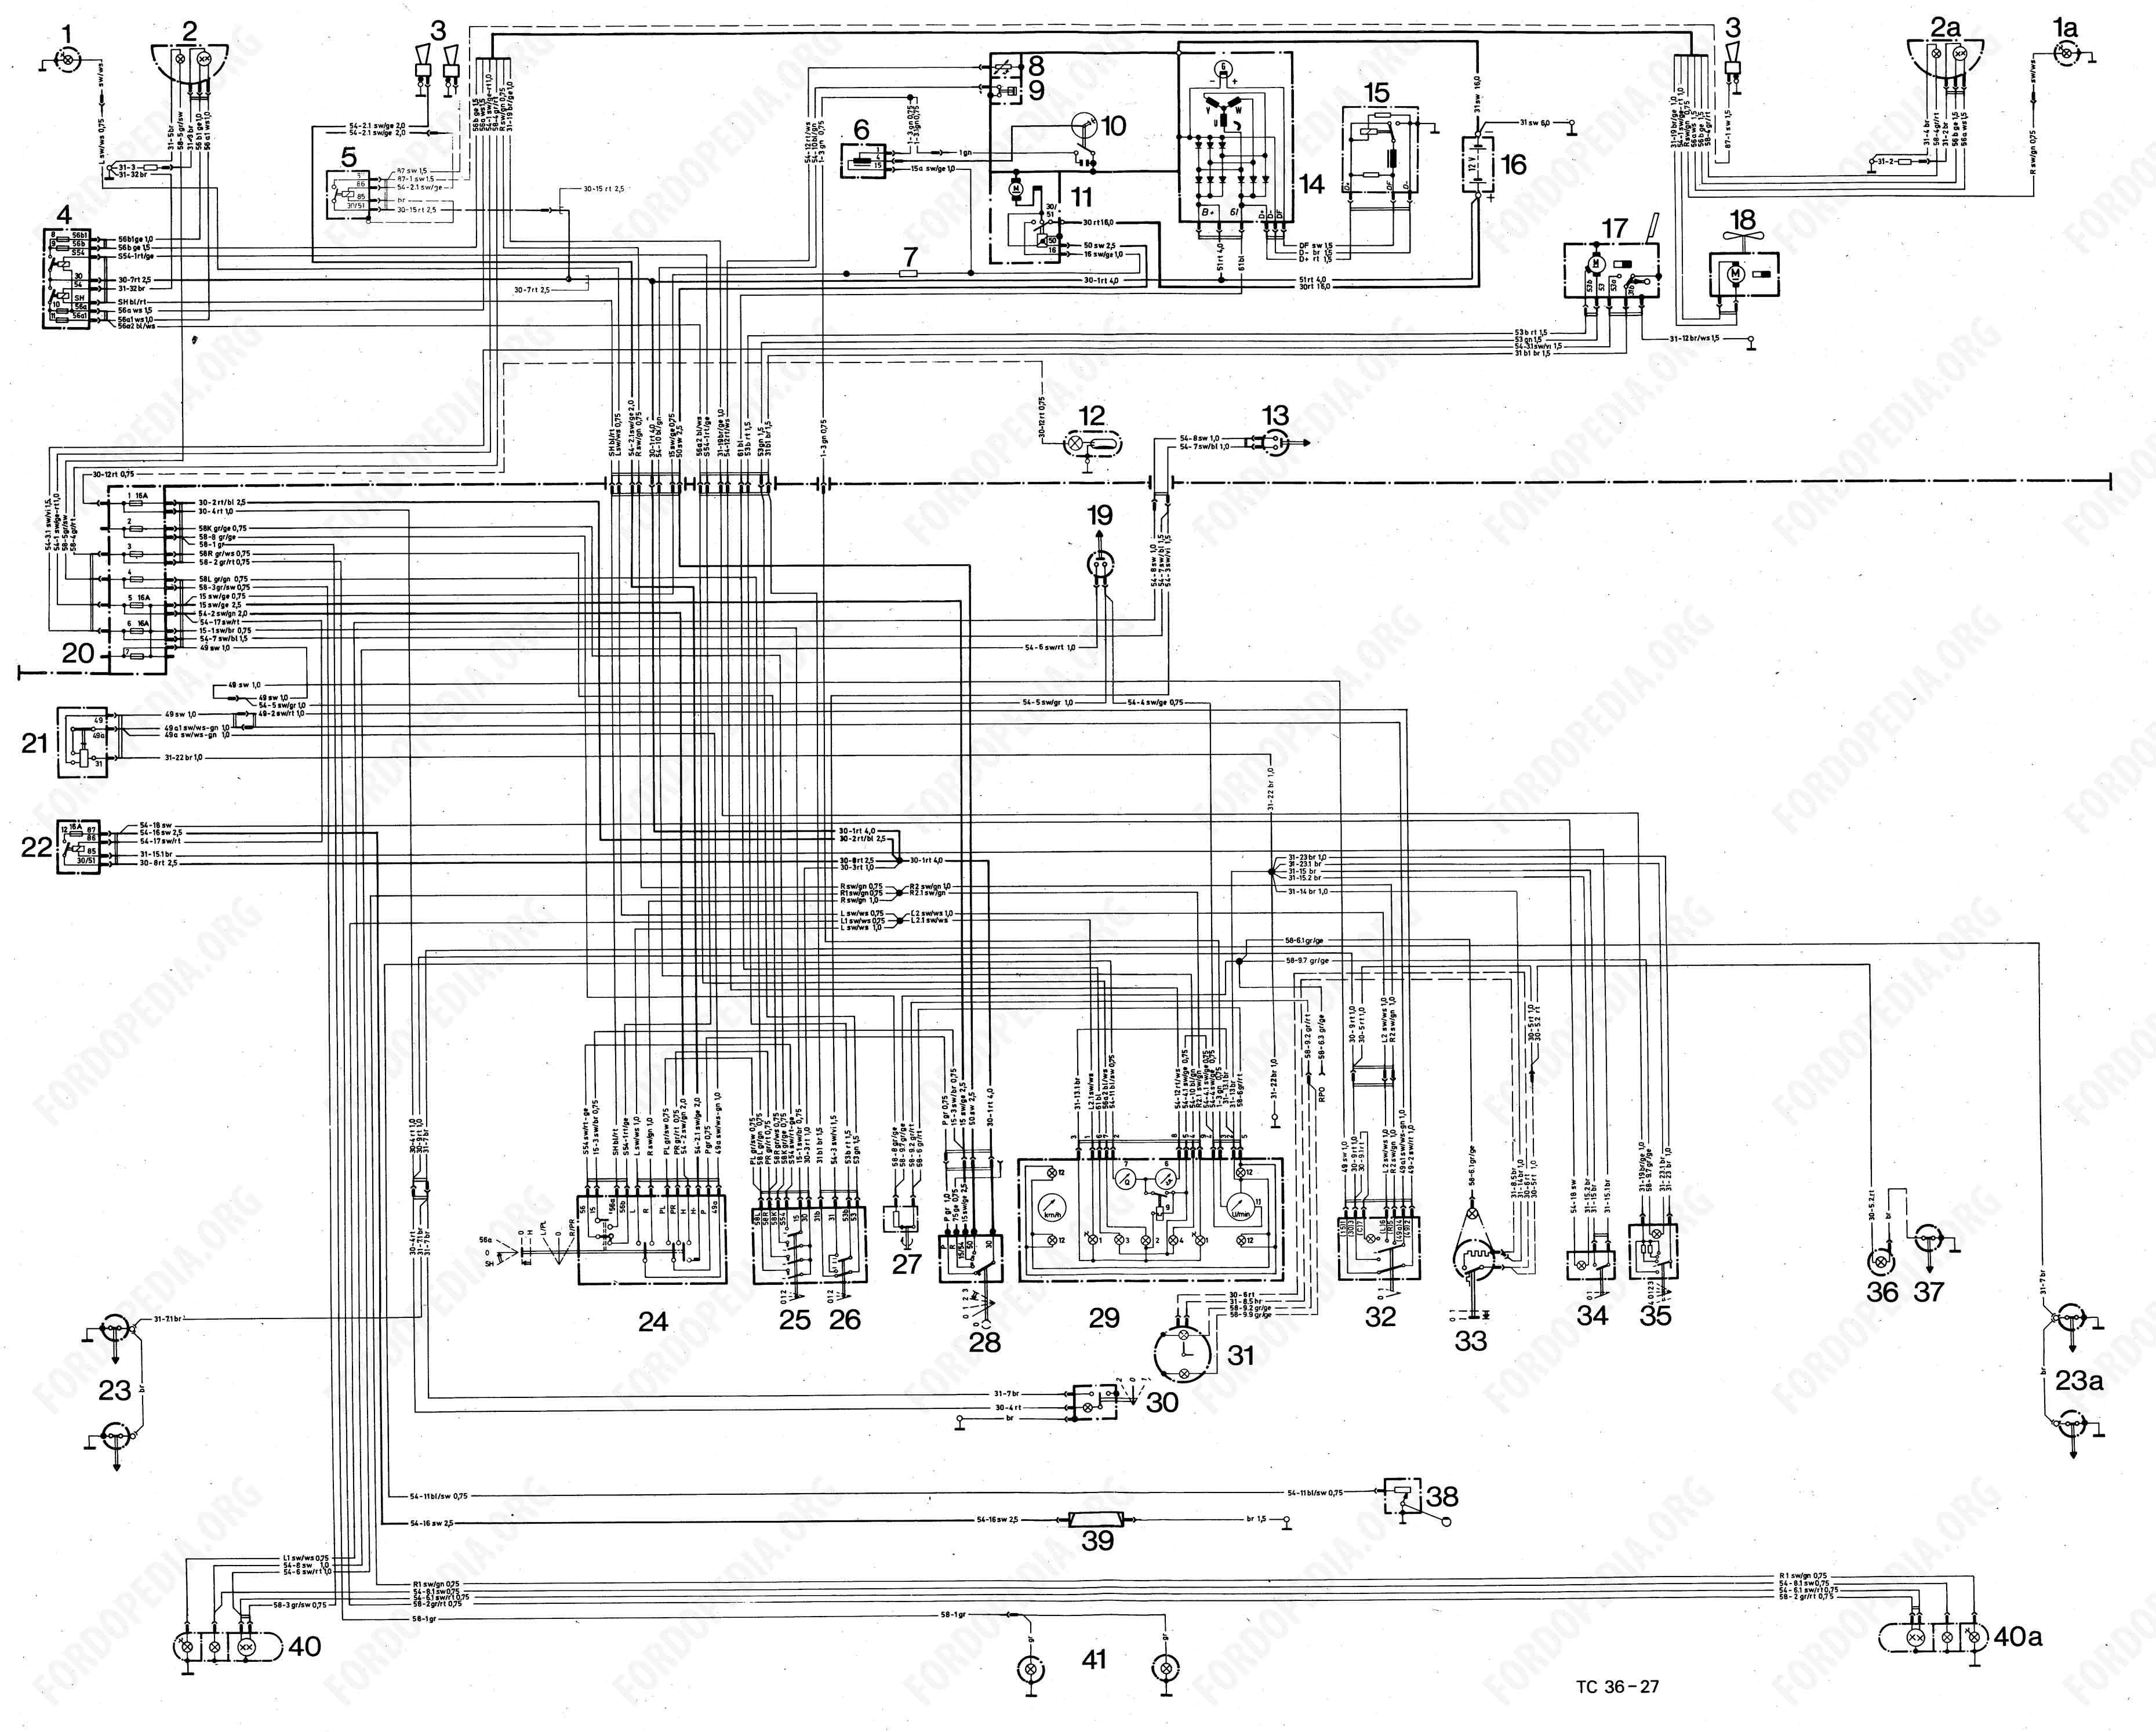 Wiring Diagram Zafira A Pdf Vauxhall astra 2001 Wiring Diagram 4 2l Chevy Engine Of Wiring Diagram Zafira A Pdf